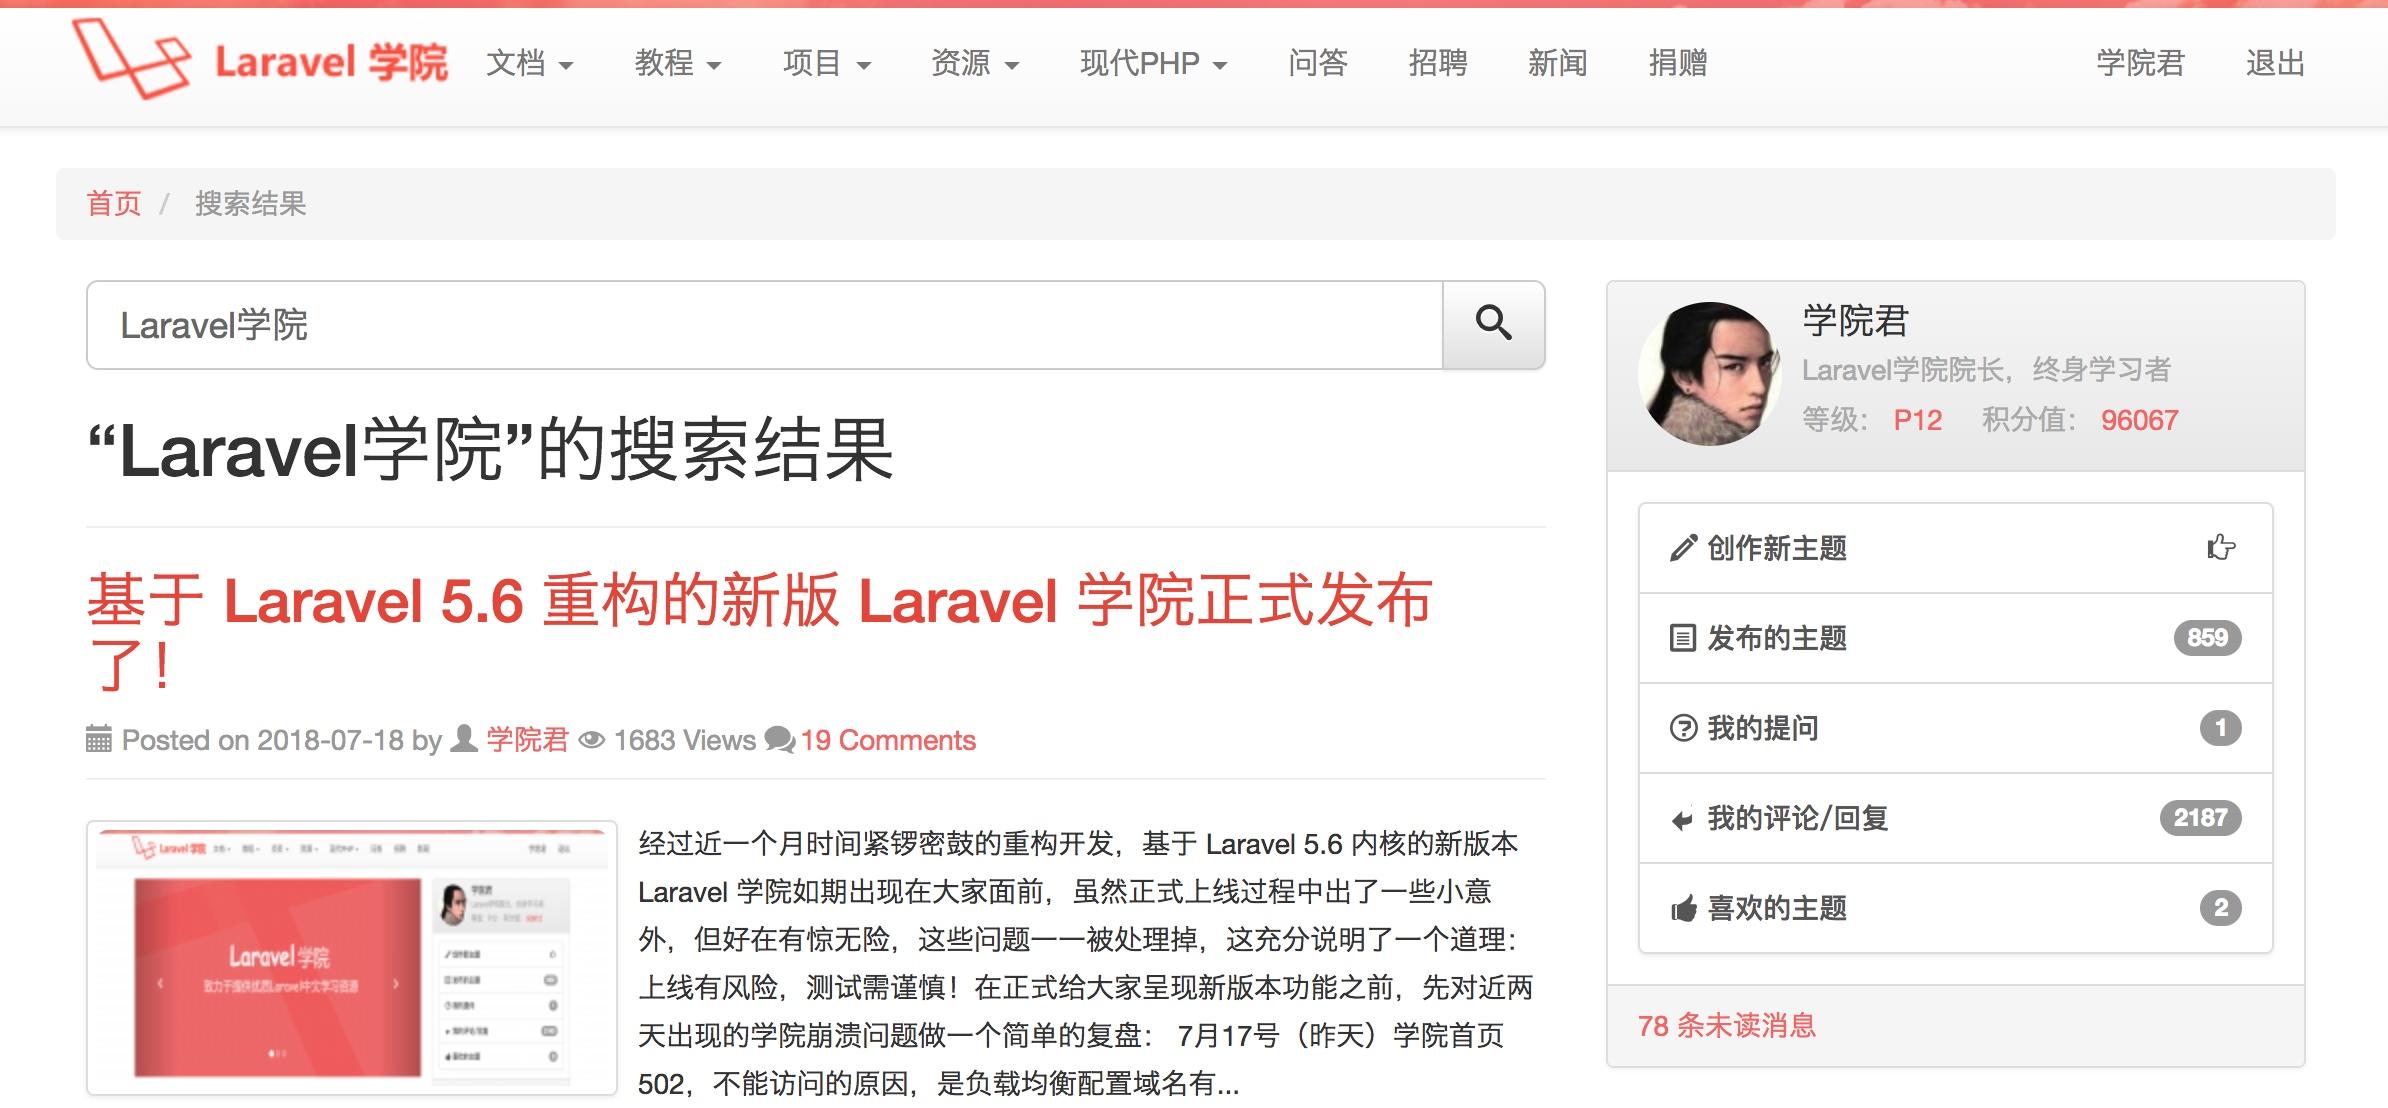 Laravel学院搜索结果页面